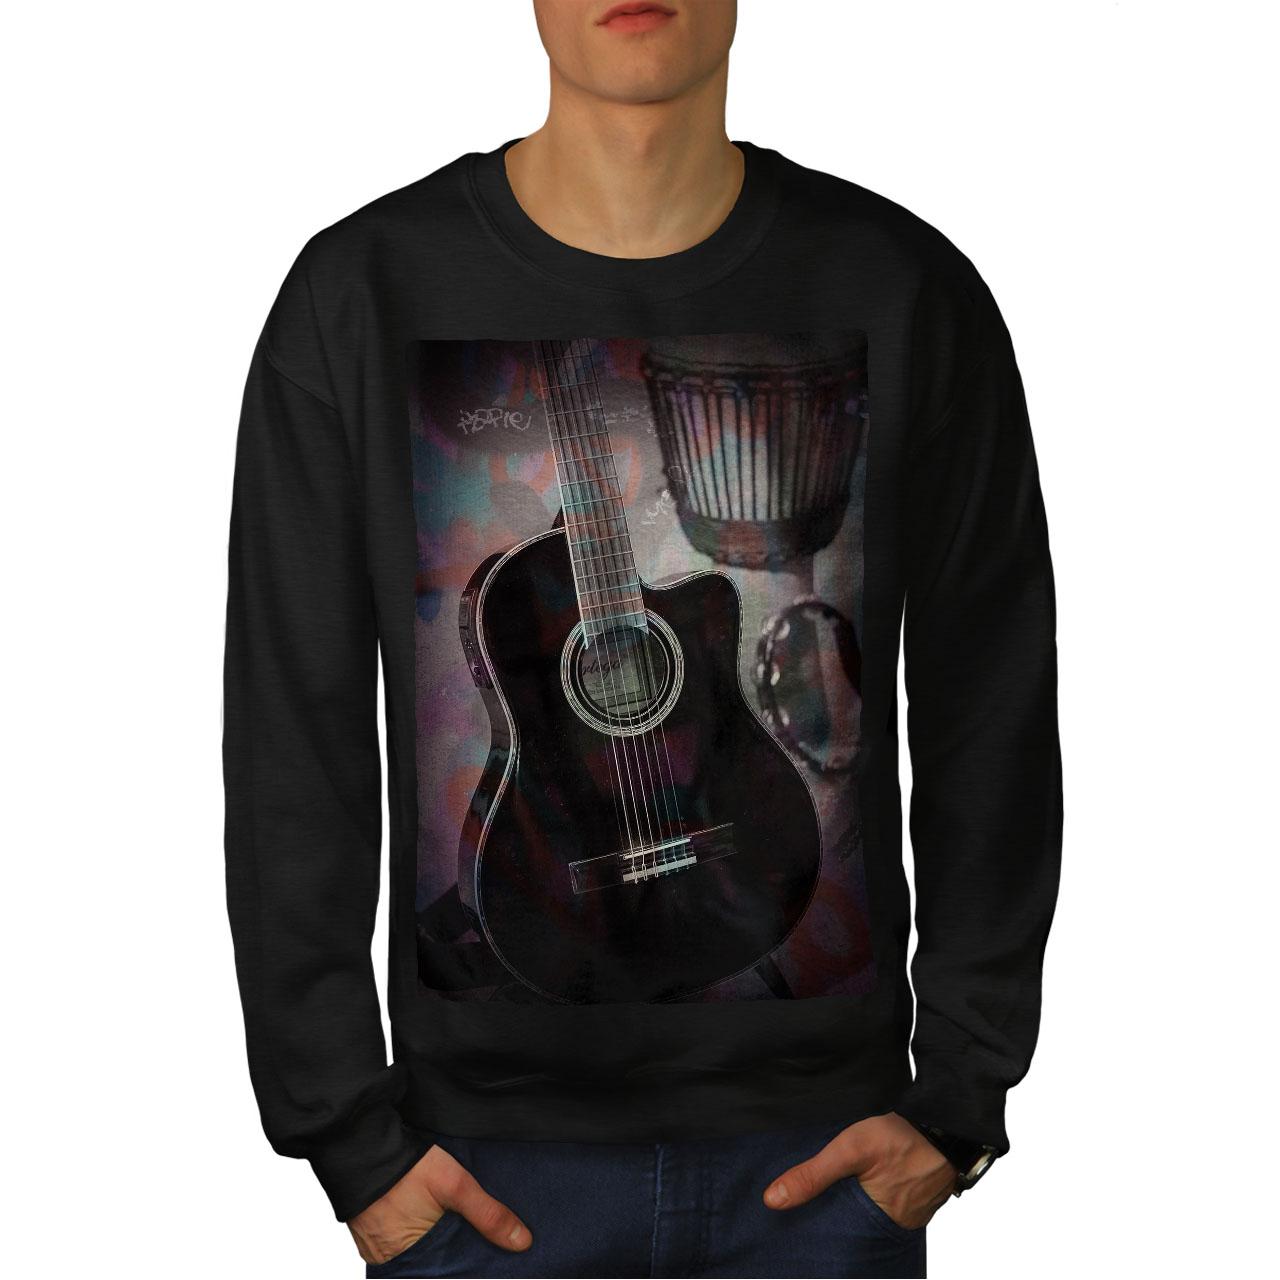 City Casual Jumper wellcoda Guitar City Art Music Mens Sweatshirt